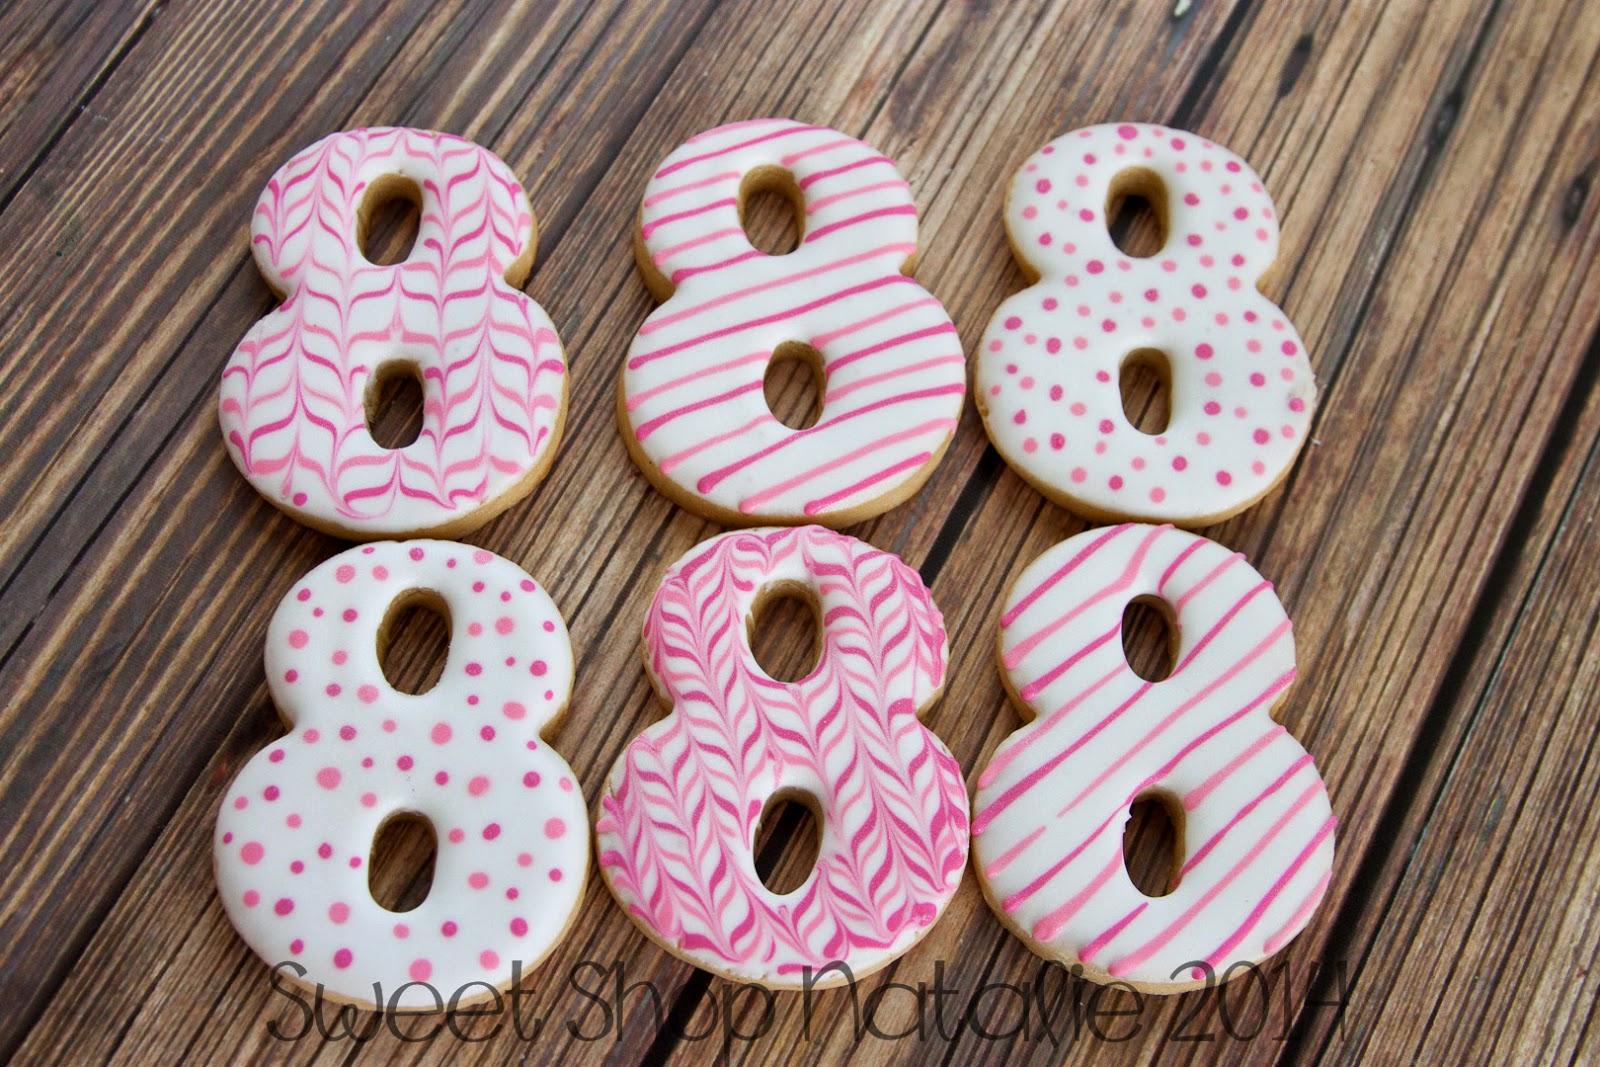 8 cookies